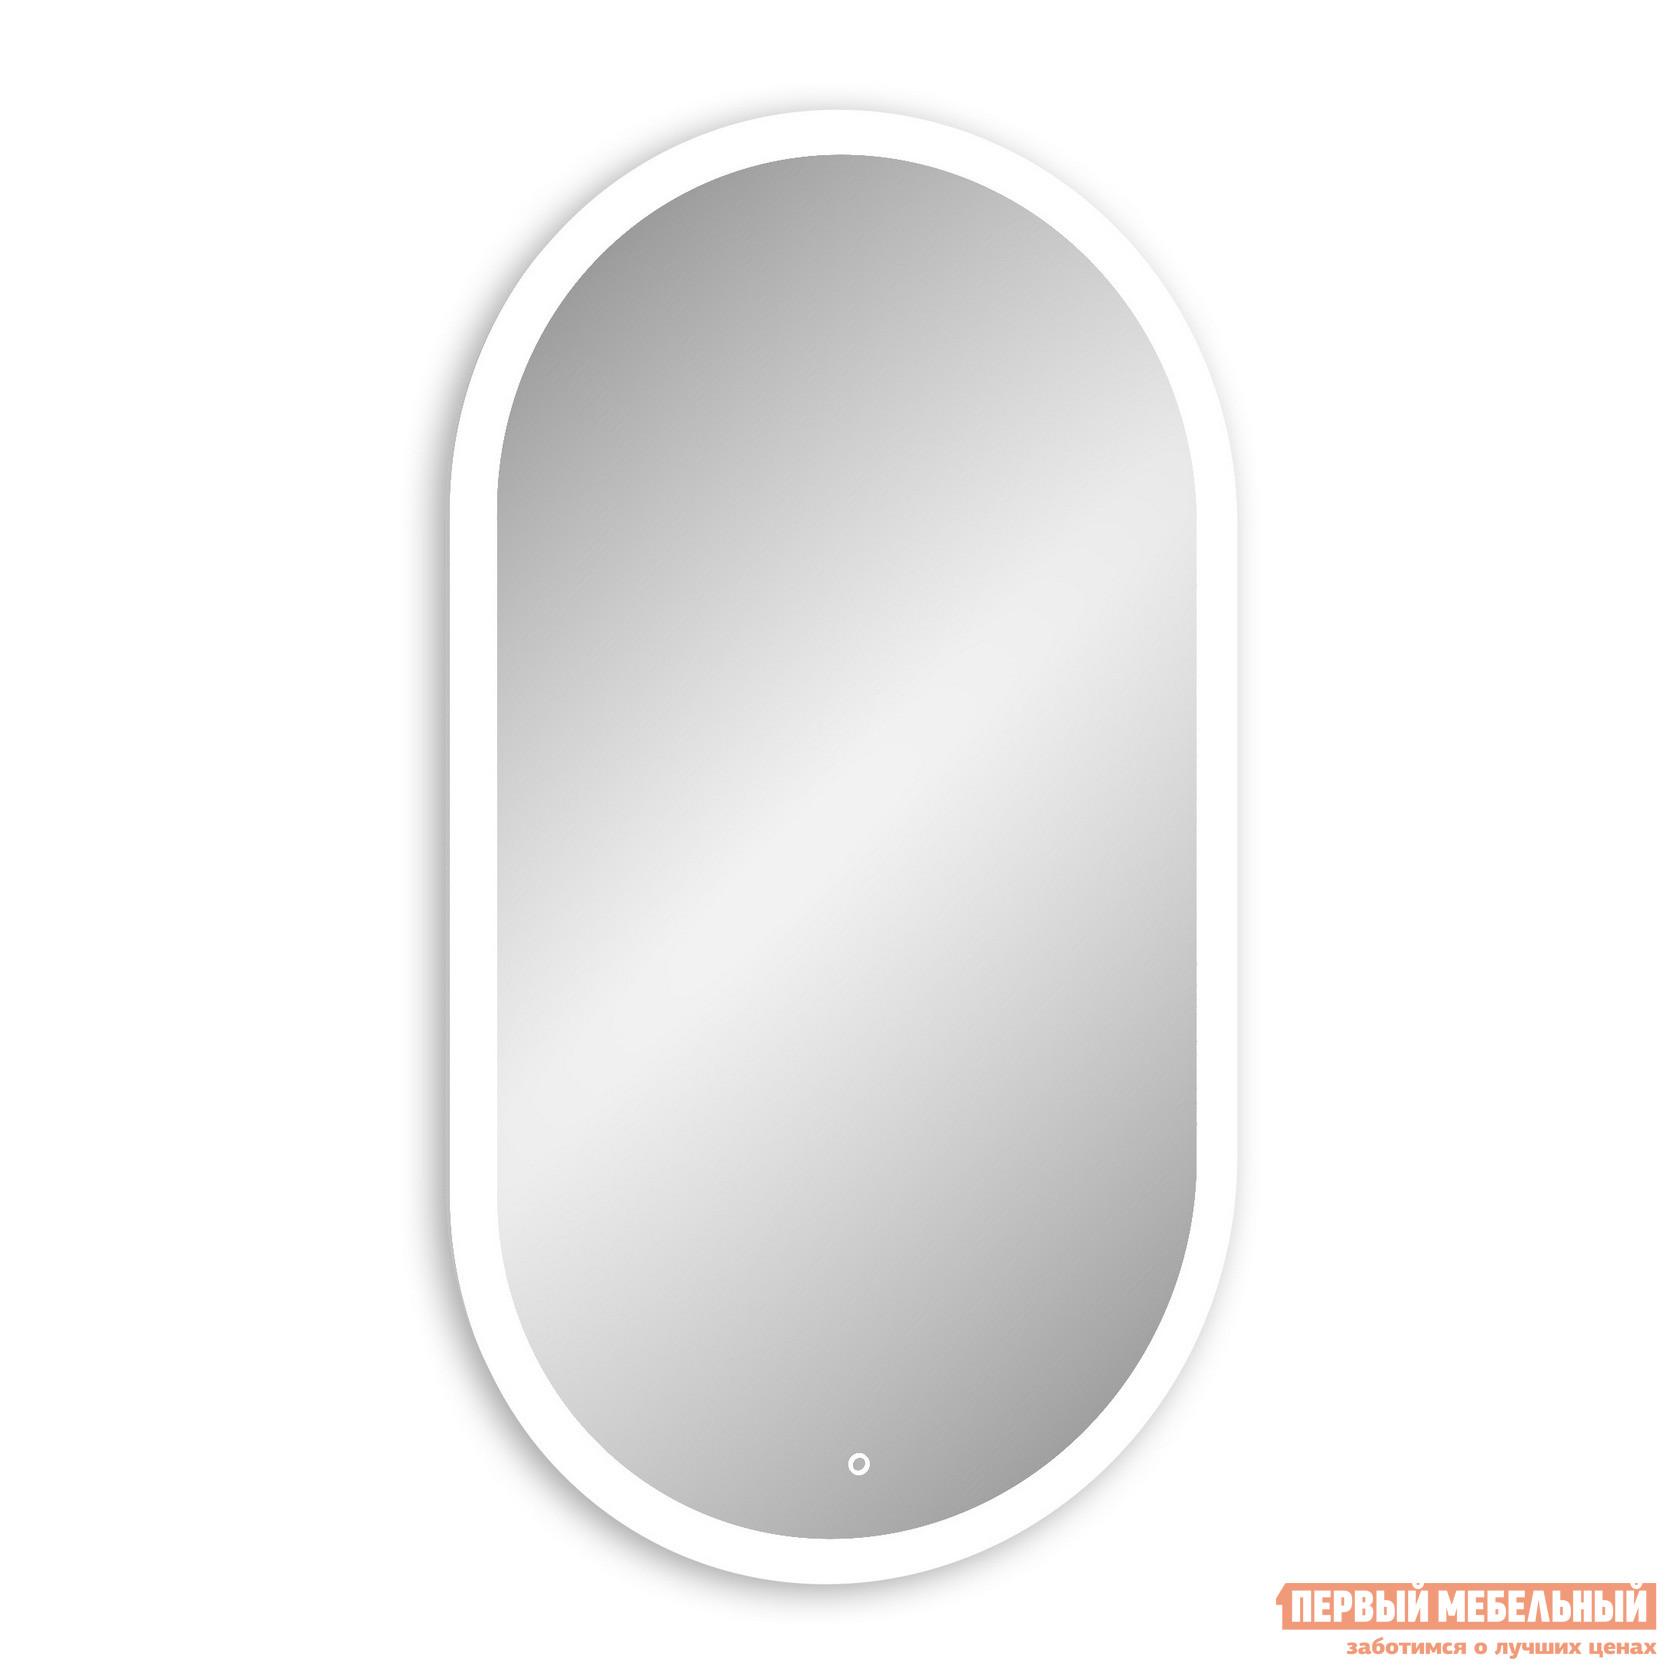 Настенное зеркало Континент Зеркало ЗЛП458 Delight LED 550х1000